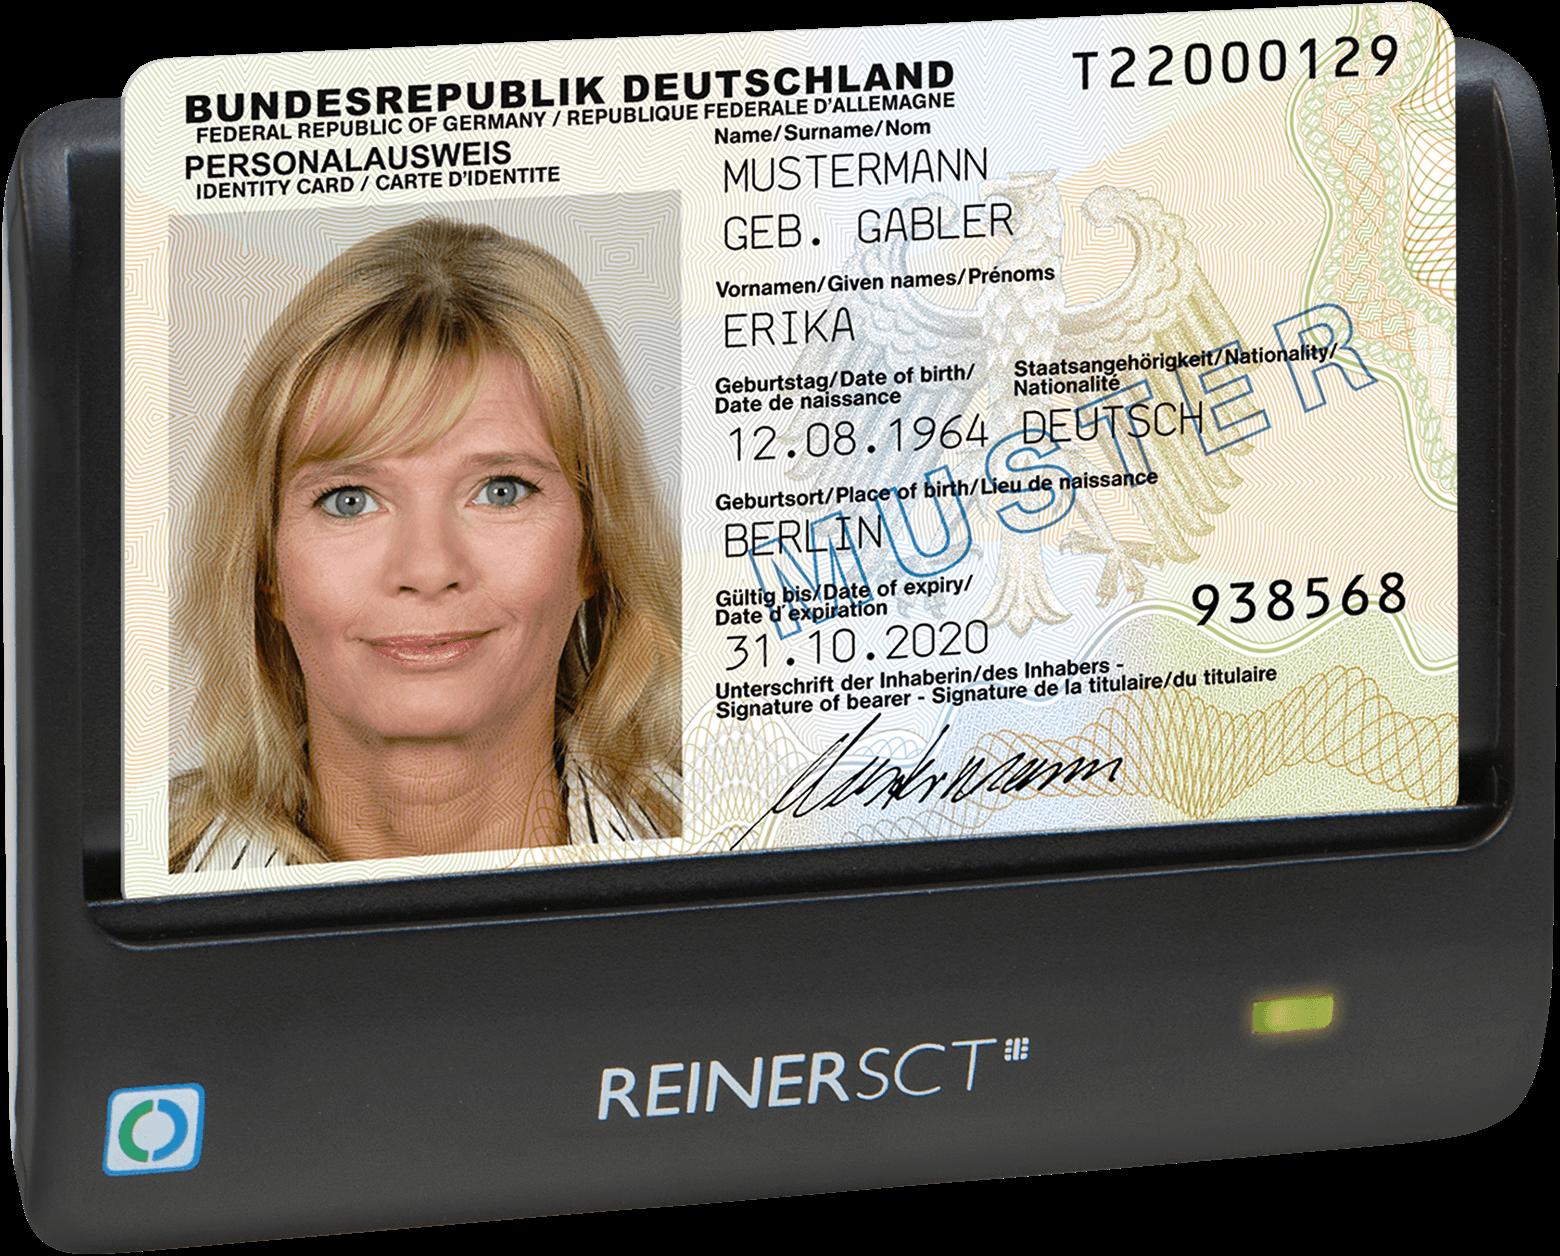 https://cdn-reichelt.de/bilder/web/xxl_ws/EB00/CYBERJACKRFID-B.png